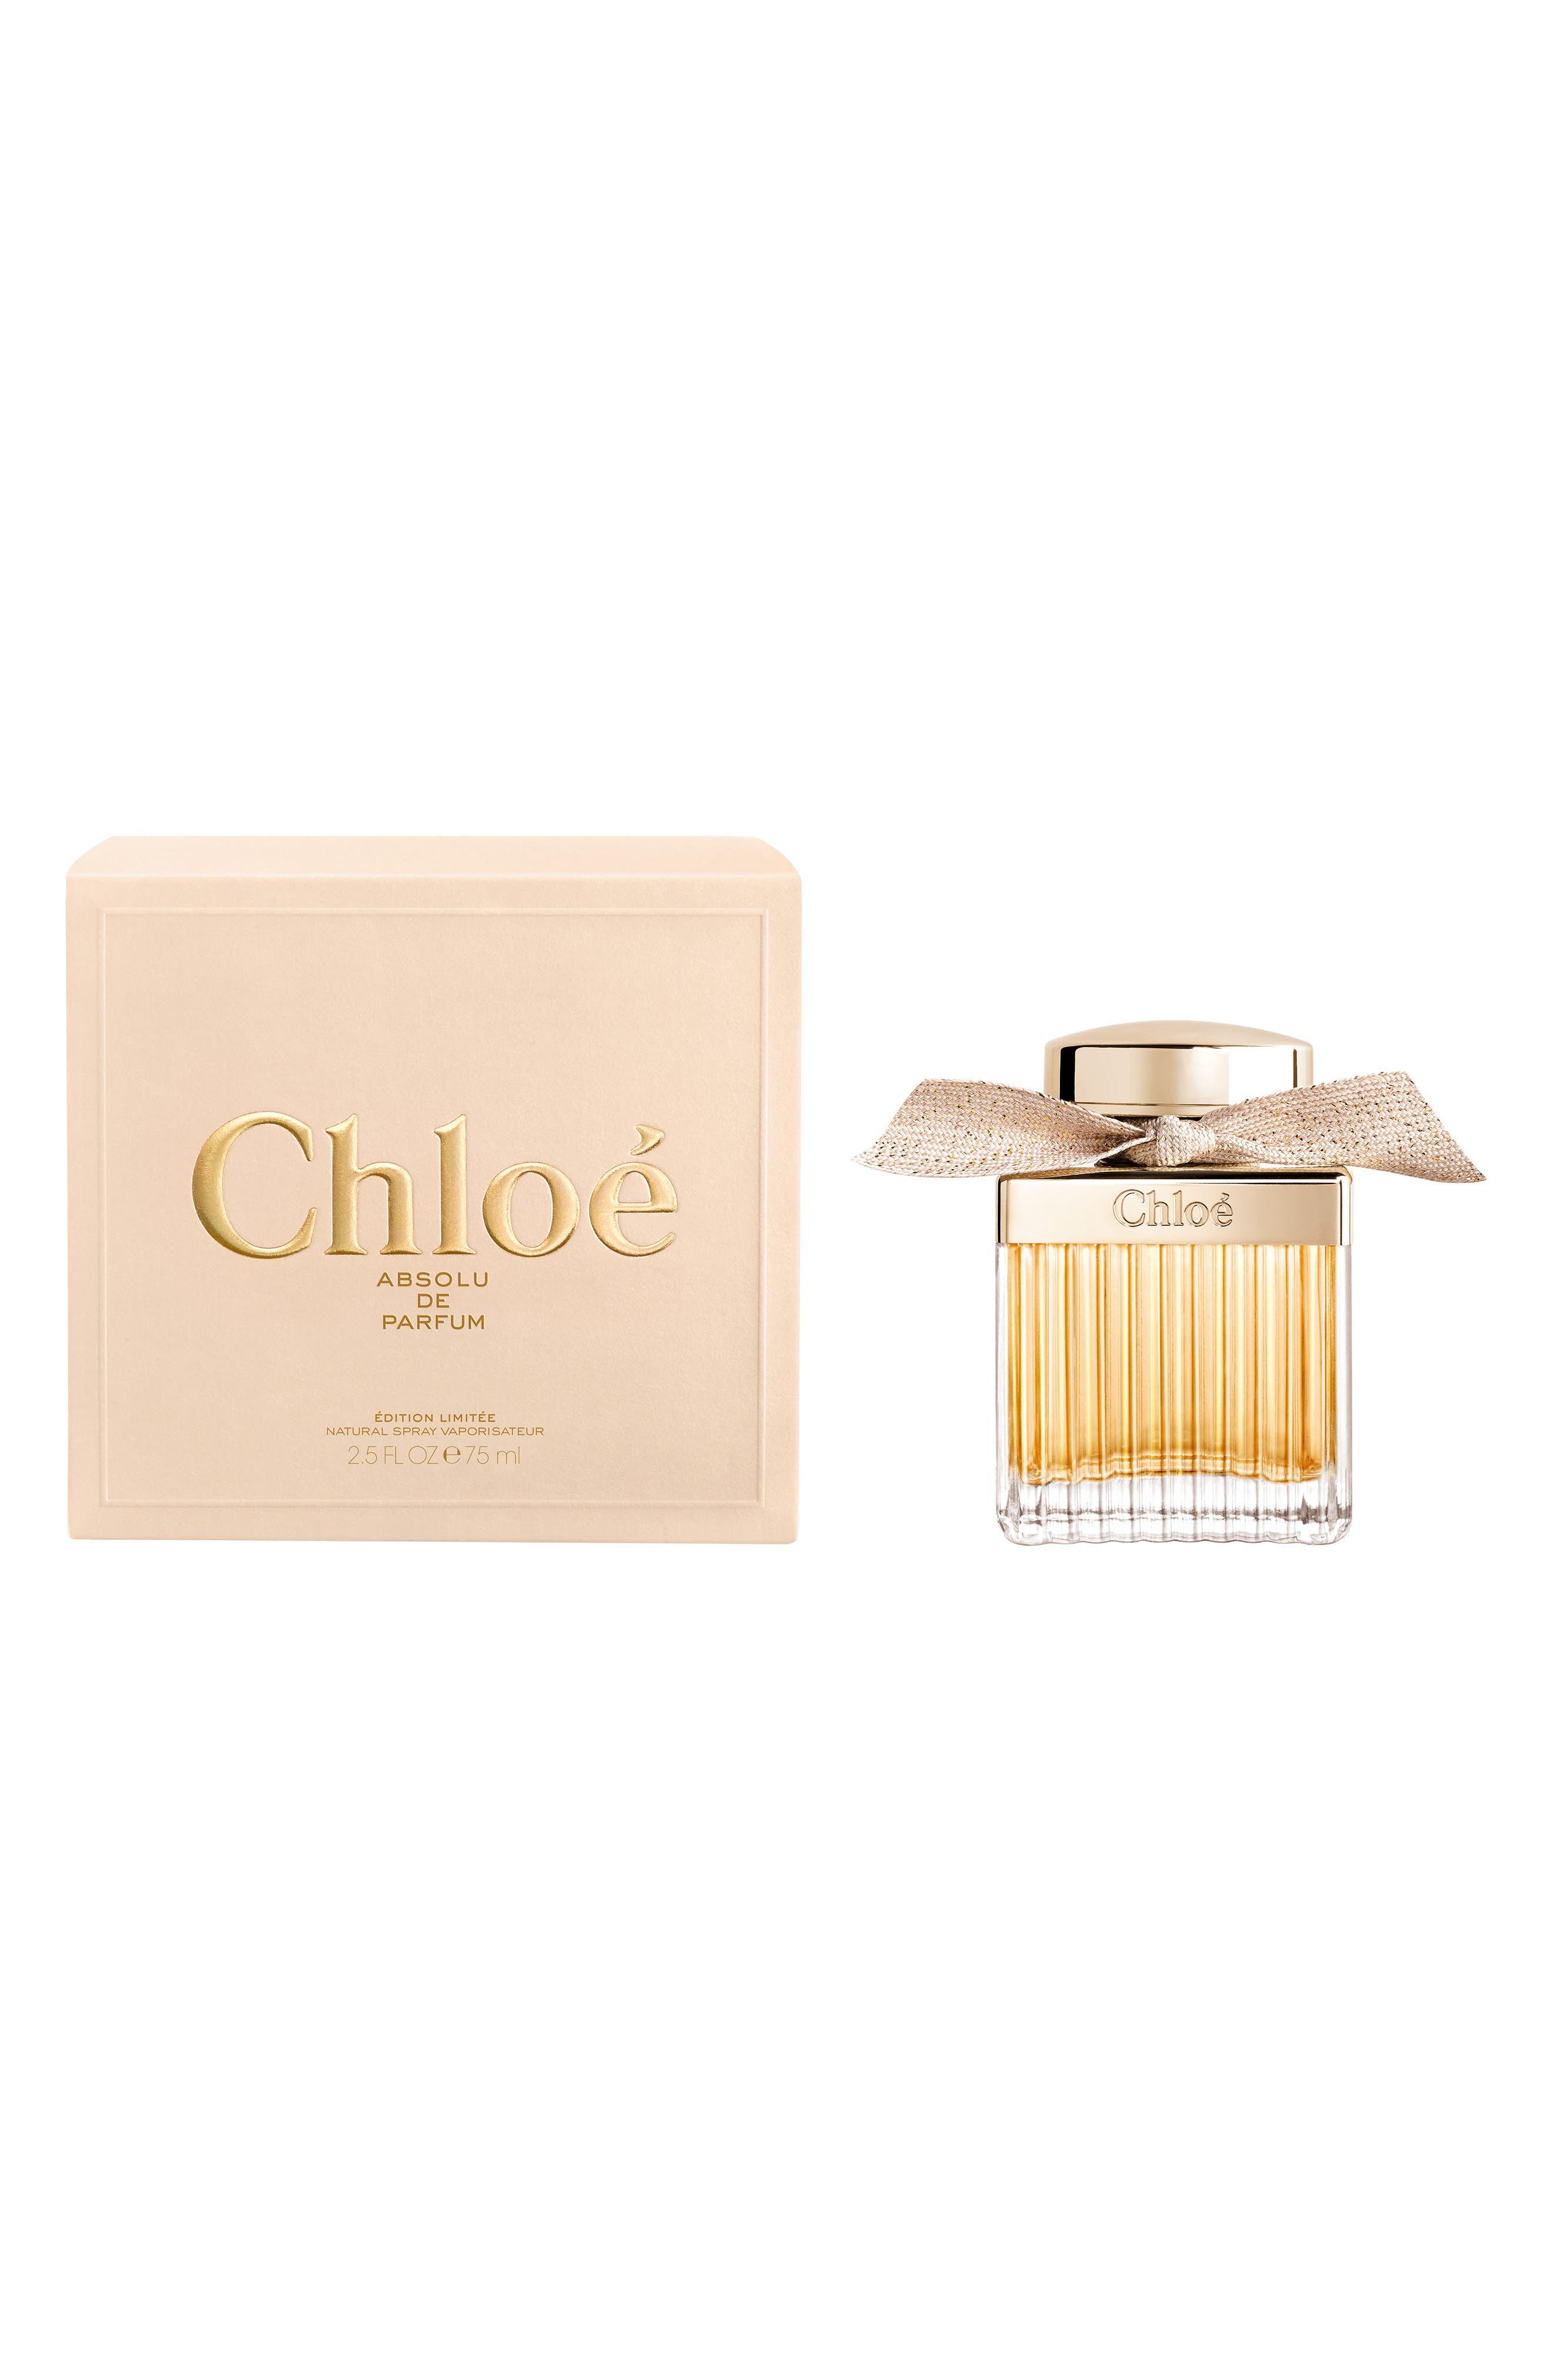 Main Image - Chloé Absolu de Parfum (Limited Edition)